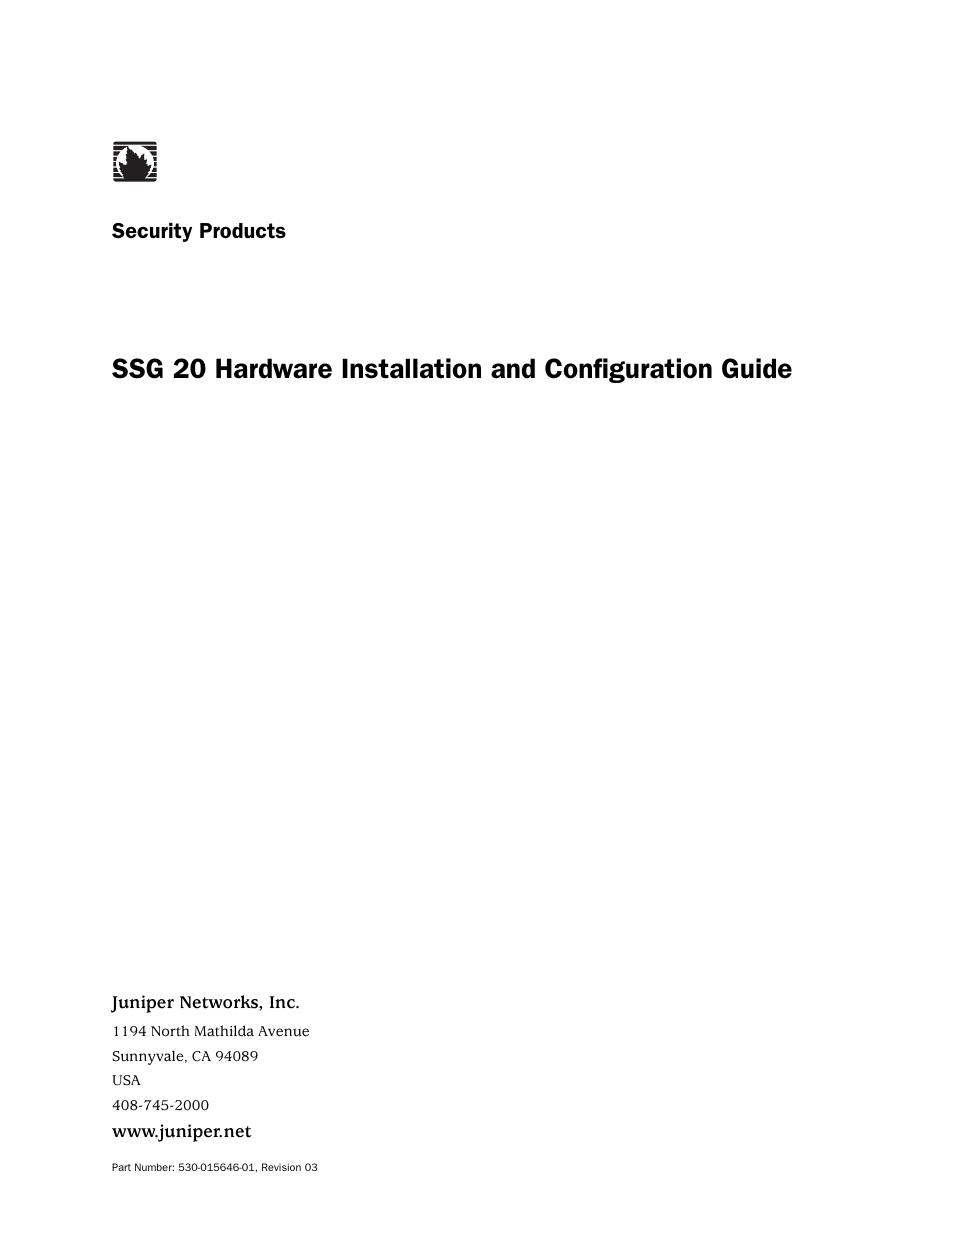 Juniper Networks SSG 20 User Manual | 86 pages